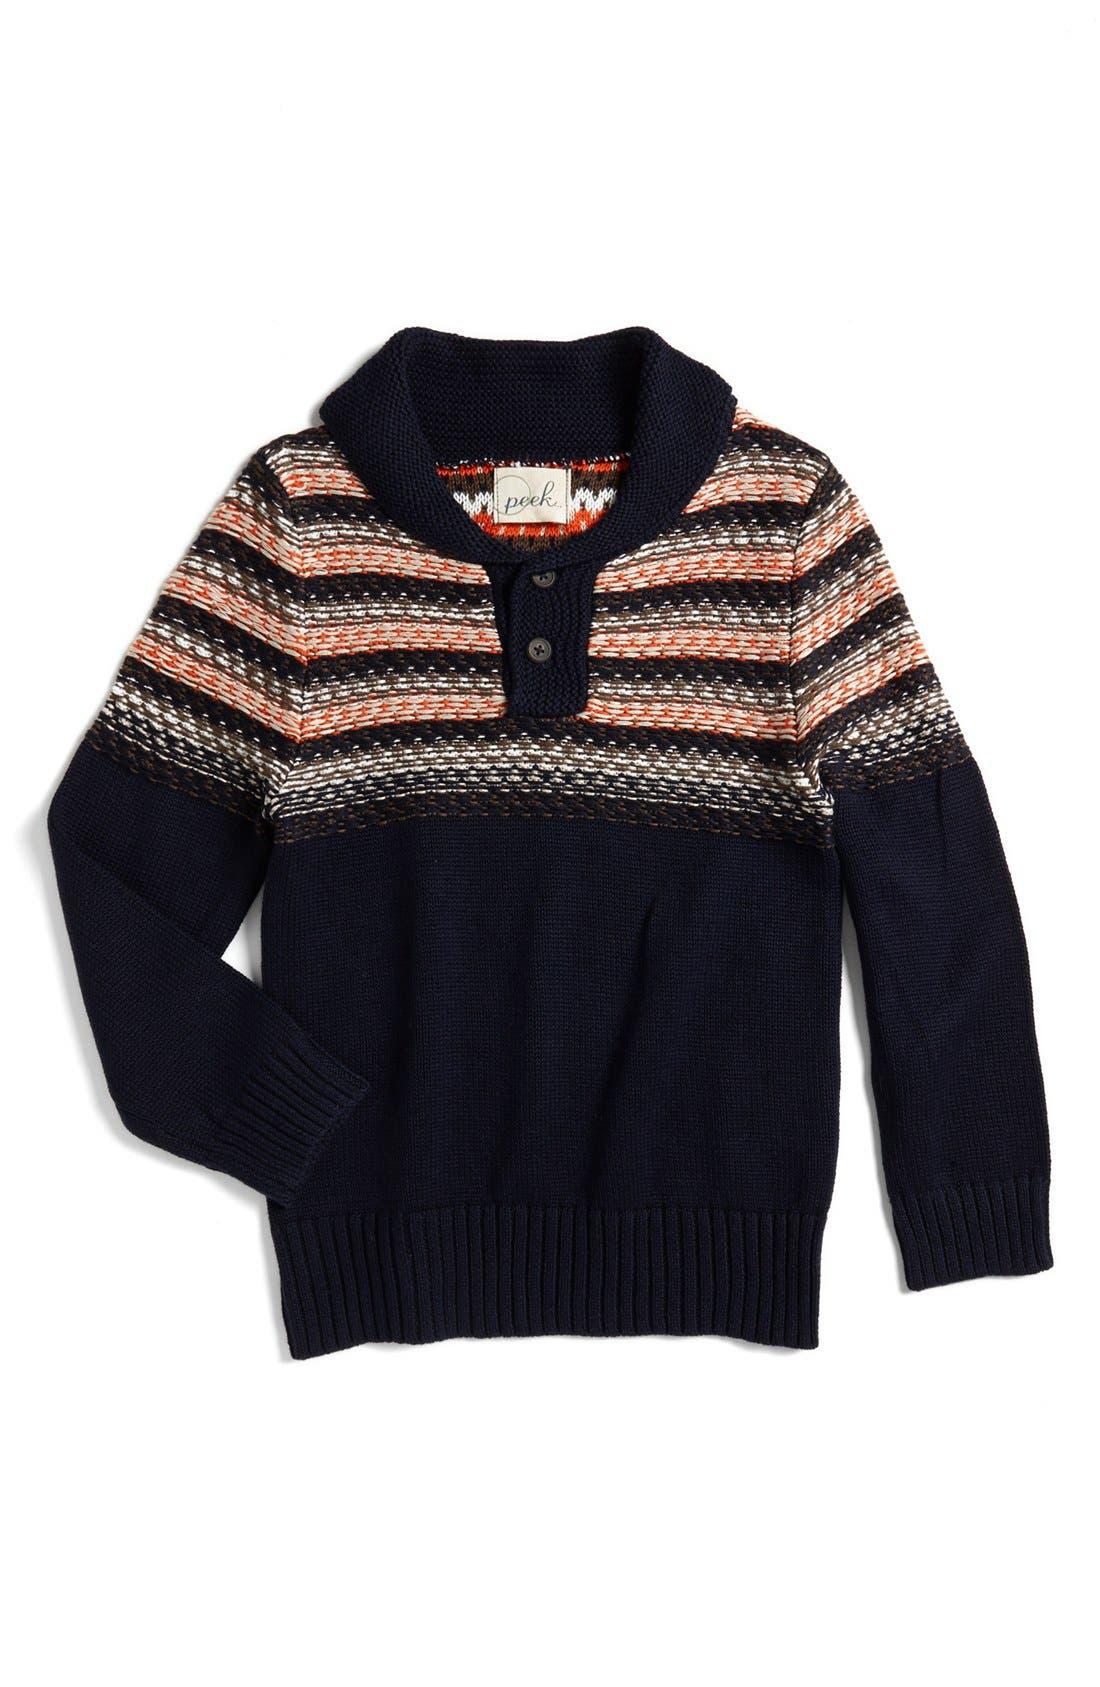 Main Image - Peek 'Grayson' Shawl Collar Sweater (Big Boys)